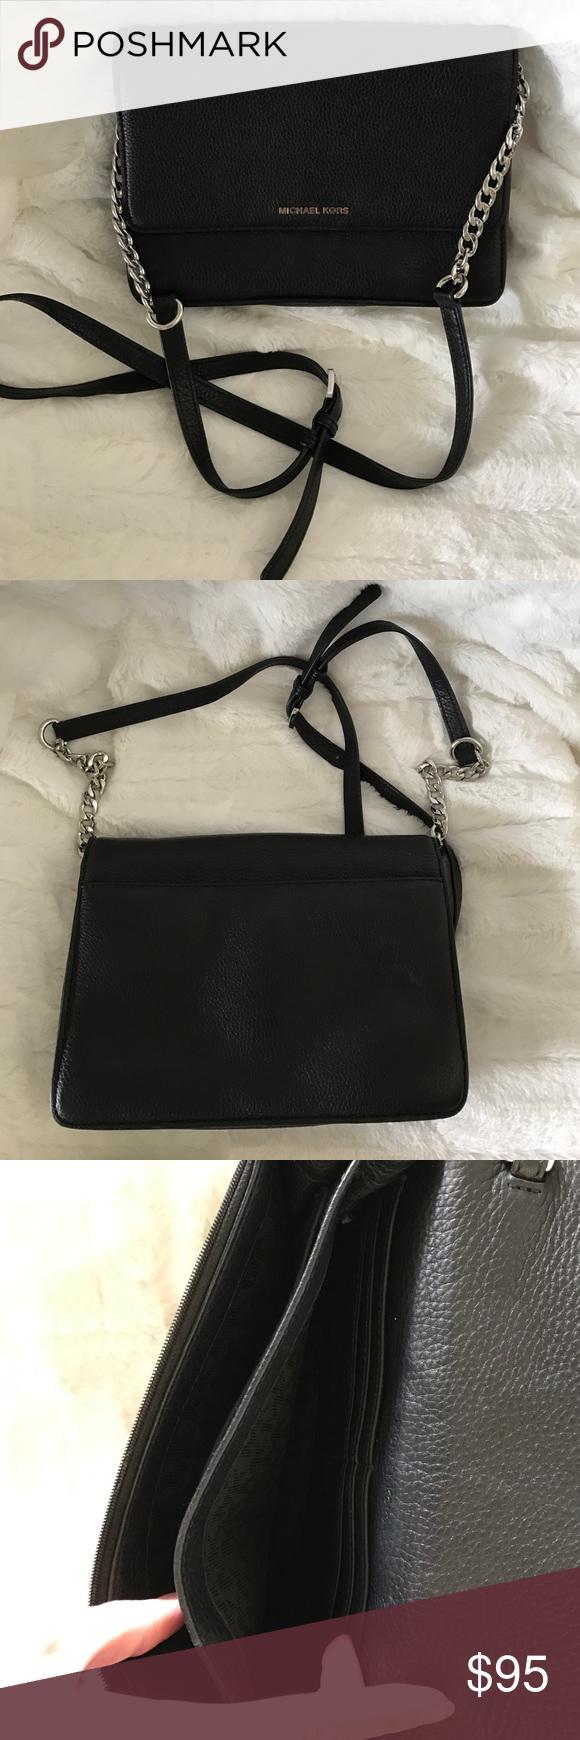 be8c52cd61ce MICHAEL KORS Daniela Large Leather Crossbody Black 100% authentic Color  black Perfect condition except what